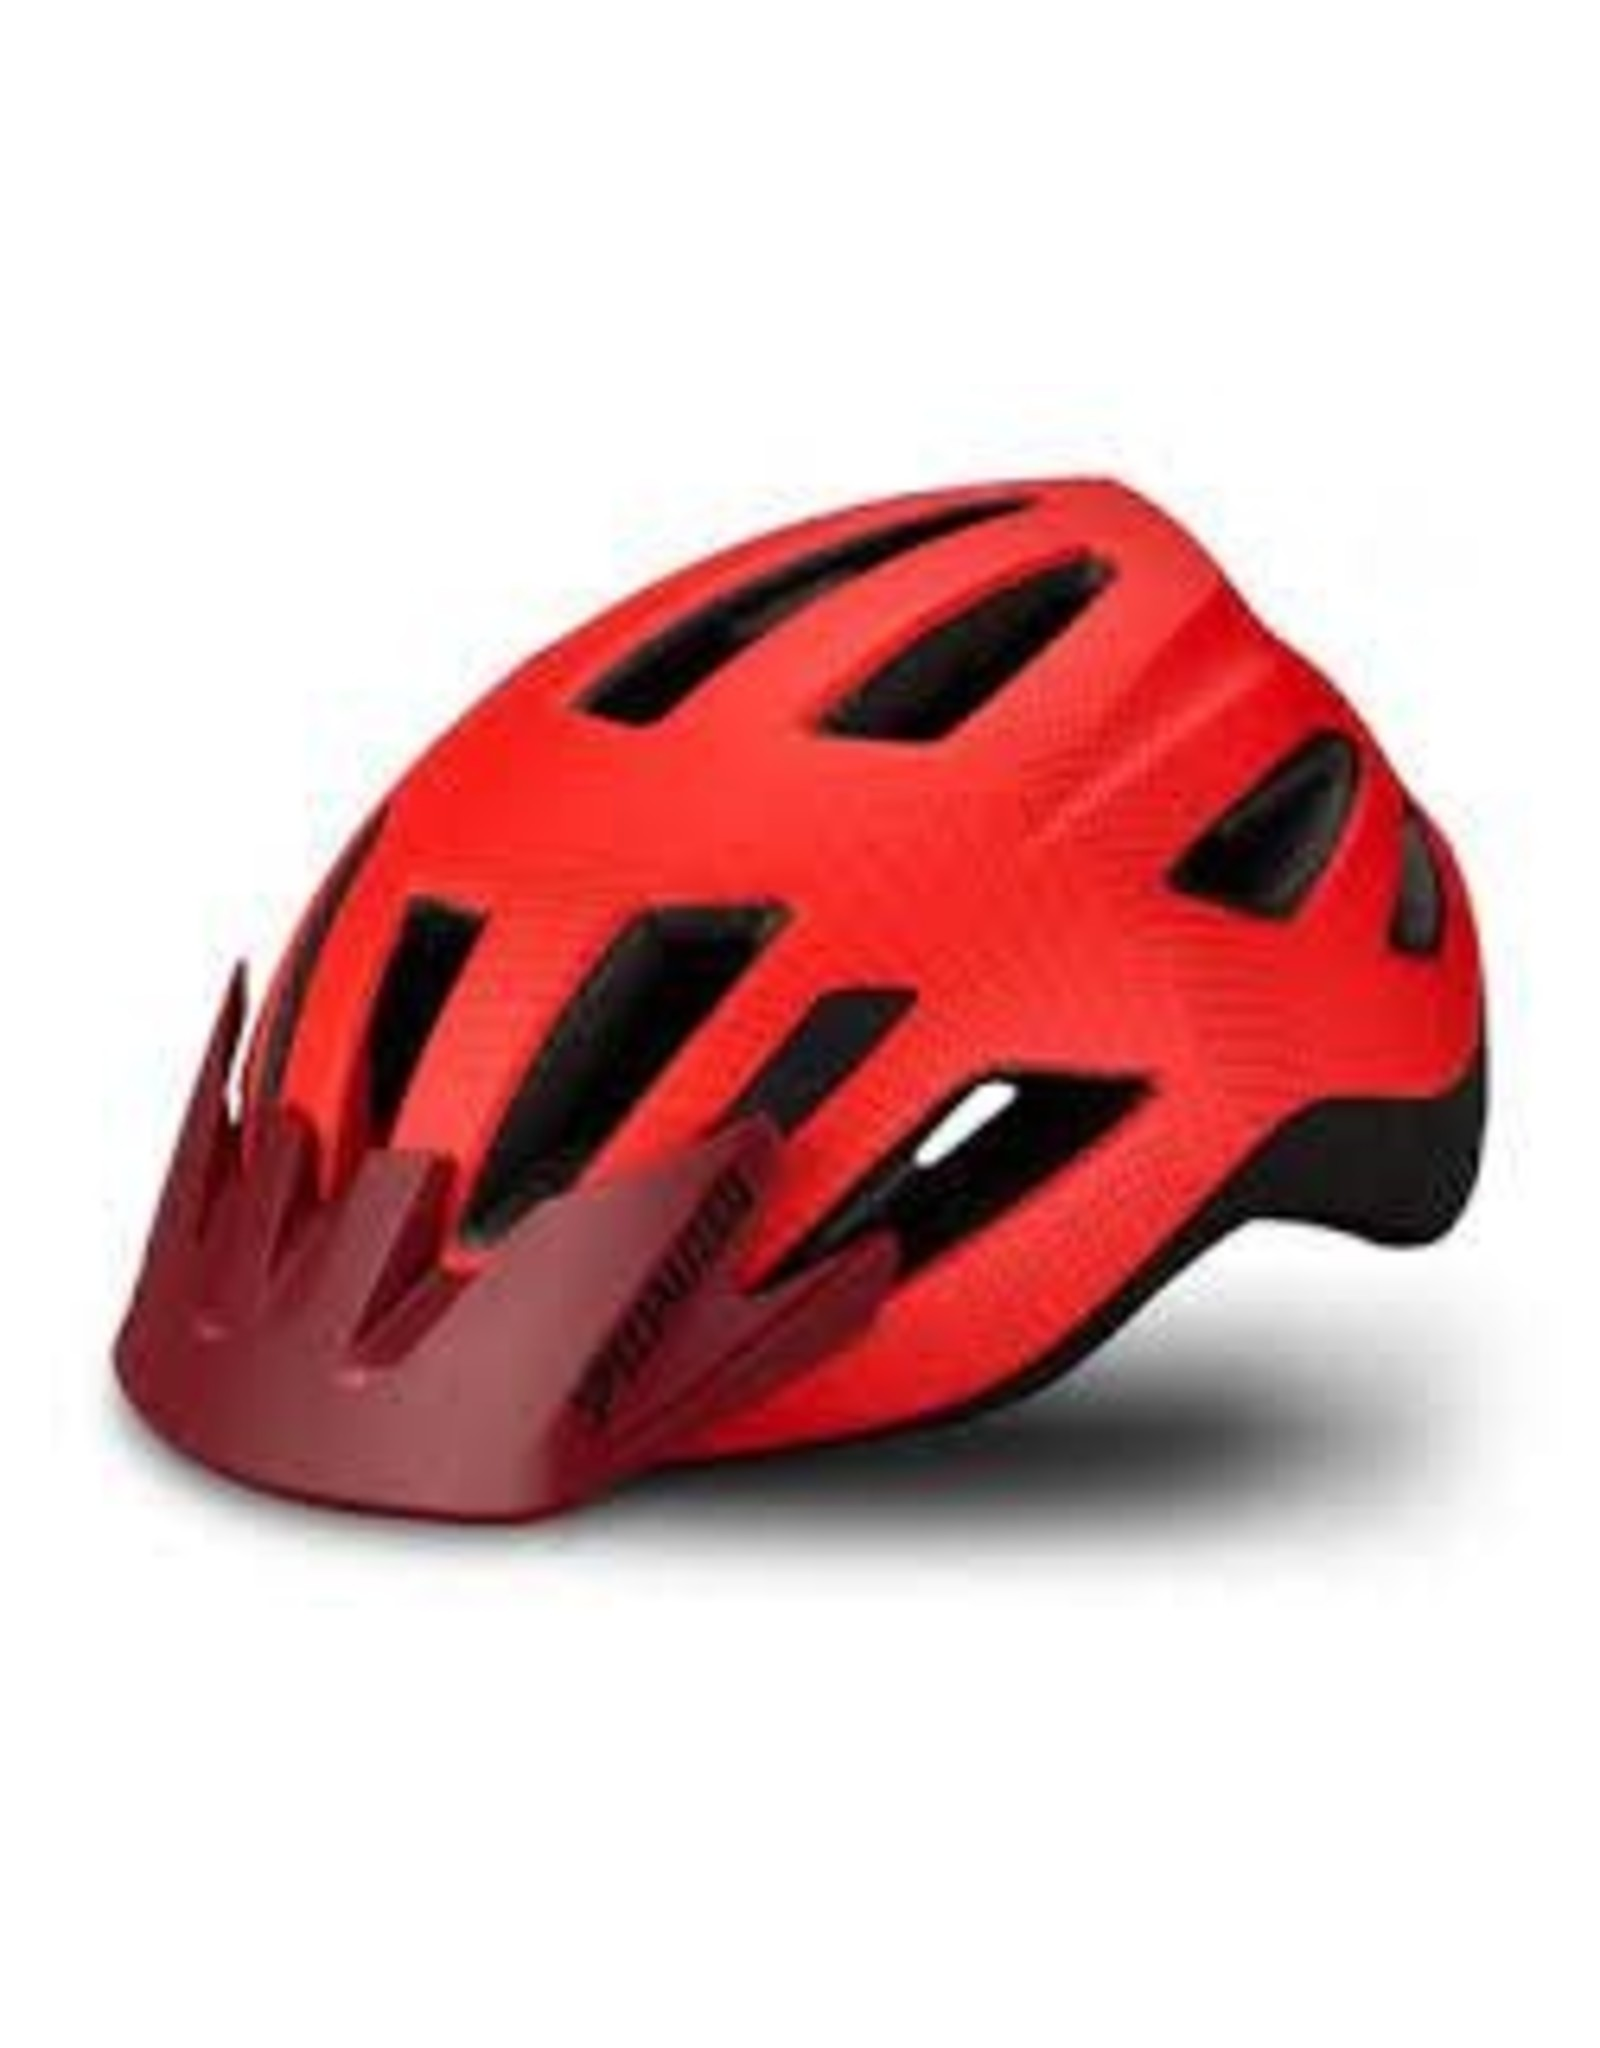 Specialized Helmet Spec Shuffle Red/Crmsn Dot Plane Child